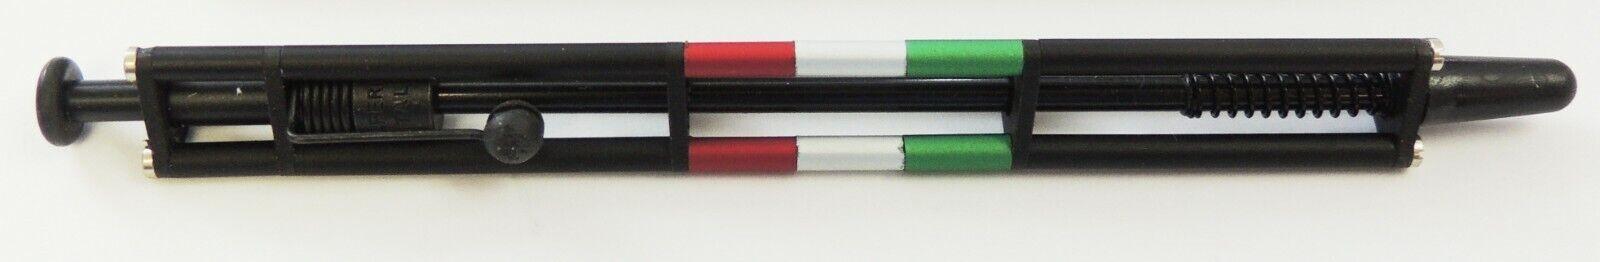 Parafernalia Revolution Ballpoint Pen, Italian Colors, New in Box (PA2184ITN) Collectibles